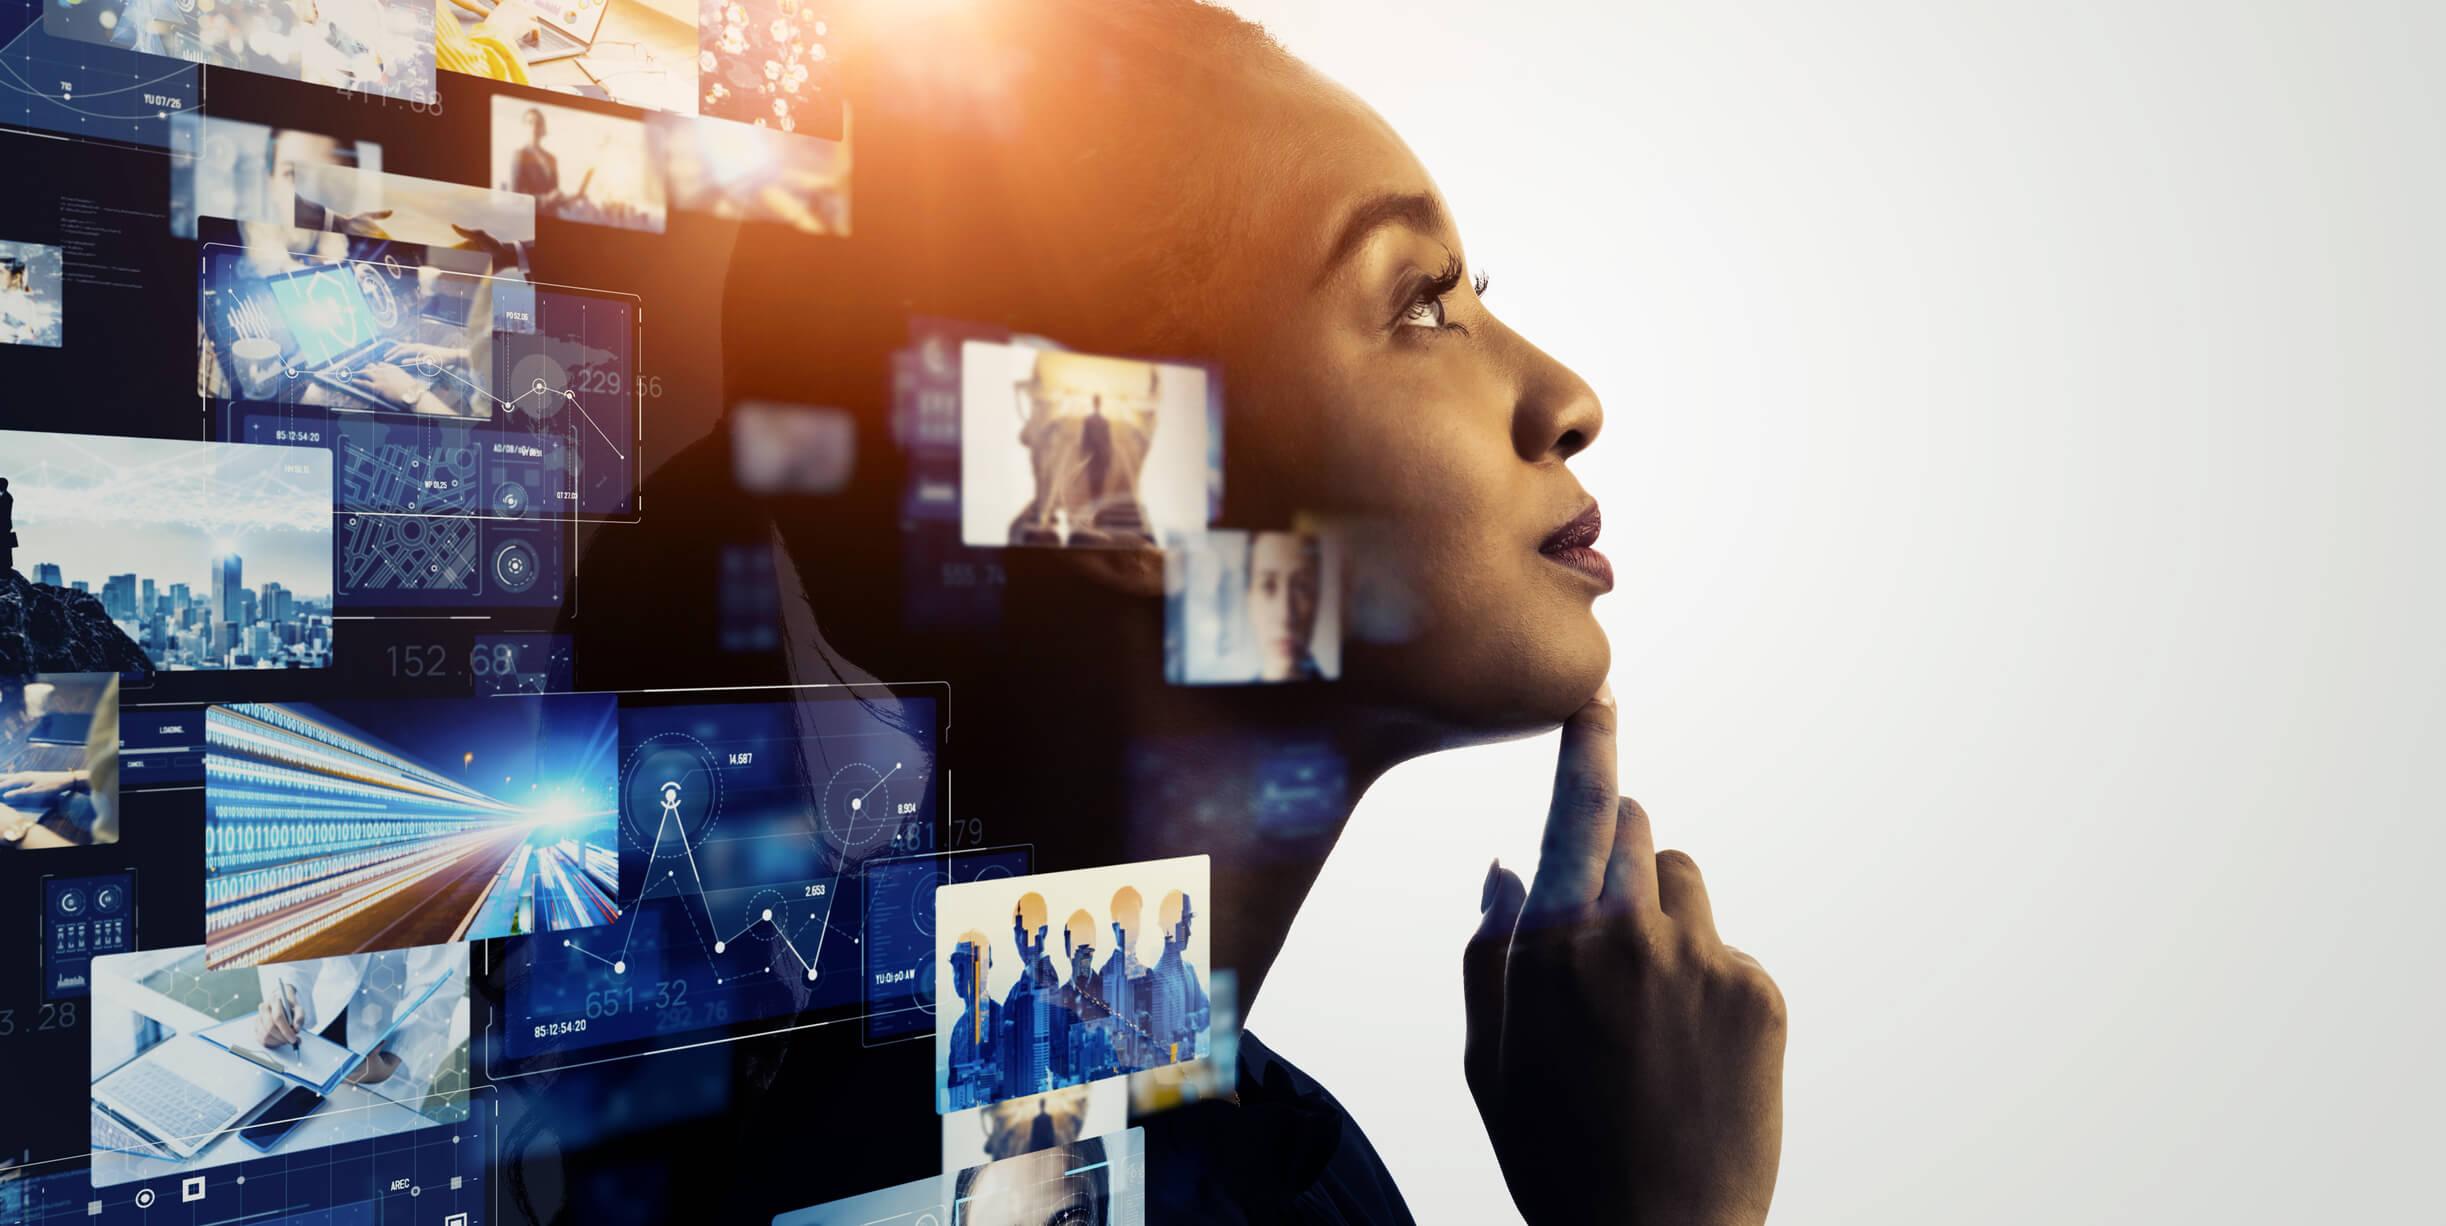 Digital Marketing Content - Complete Controller